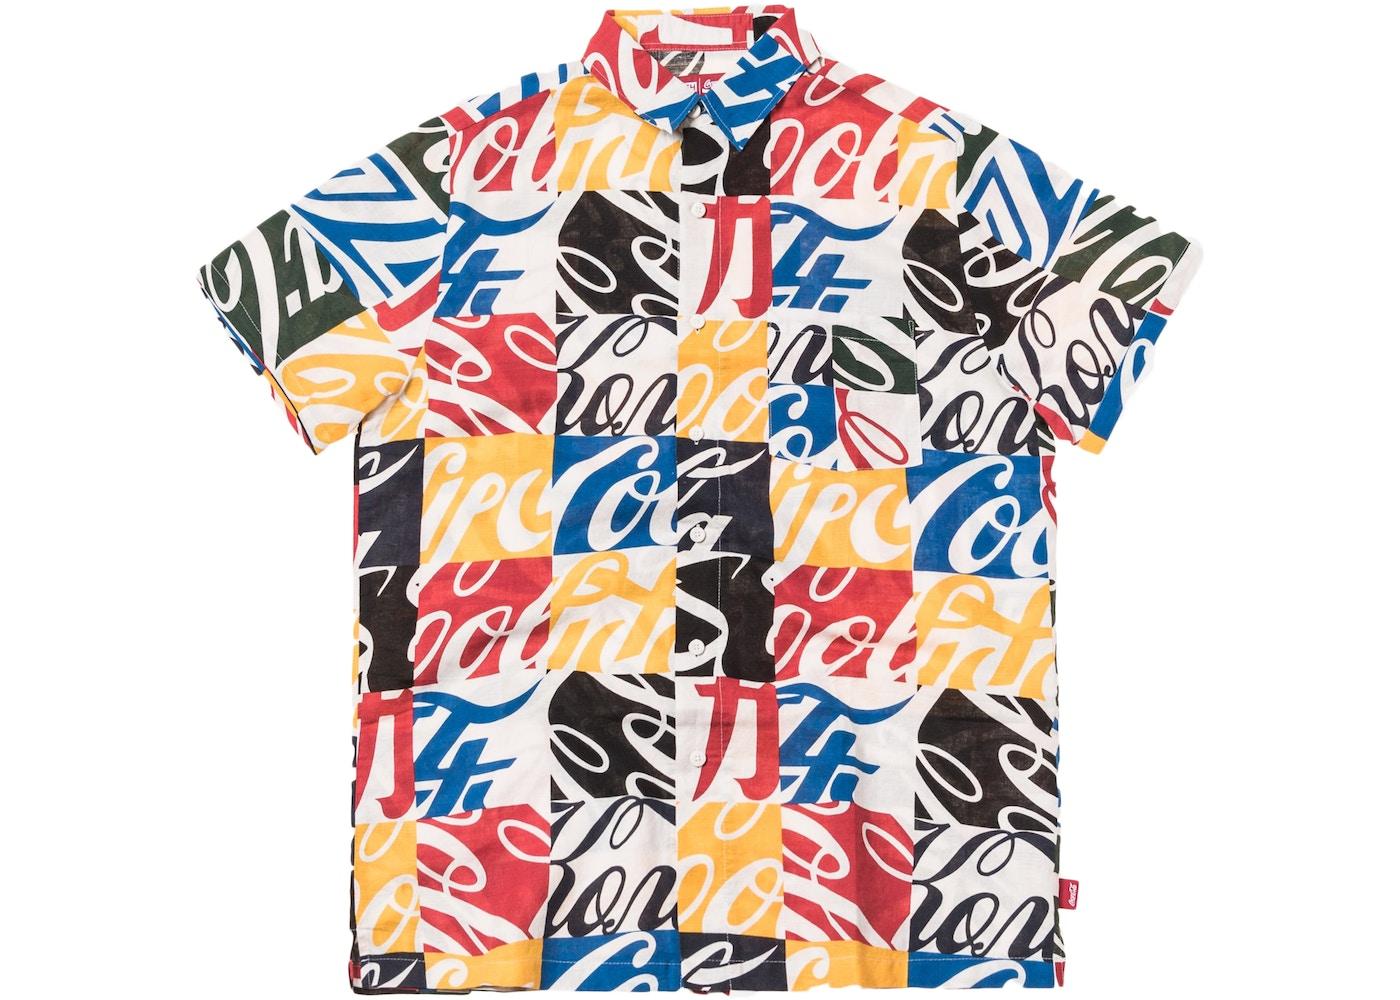 2a5a4cef3e Kith Tops/Sweatshirts - Buy & Sell Streetwear